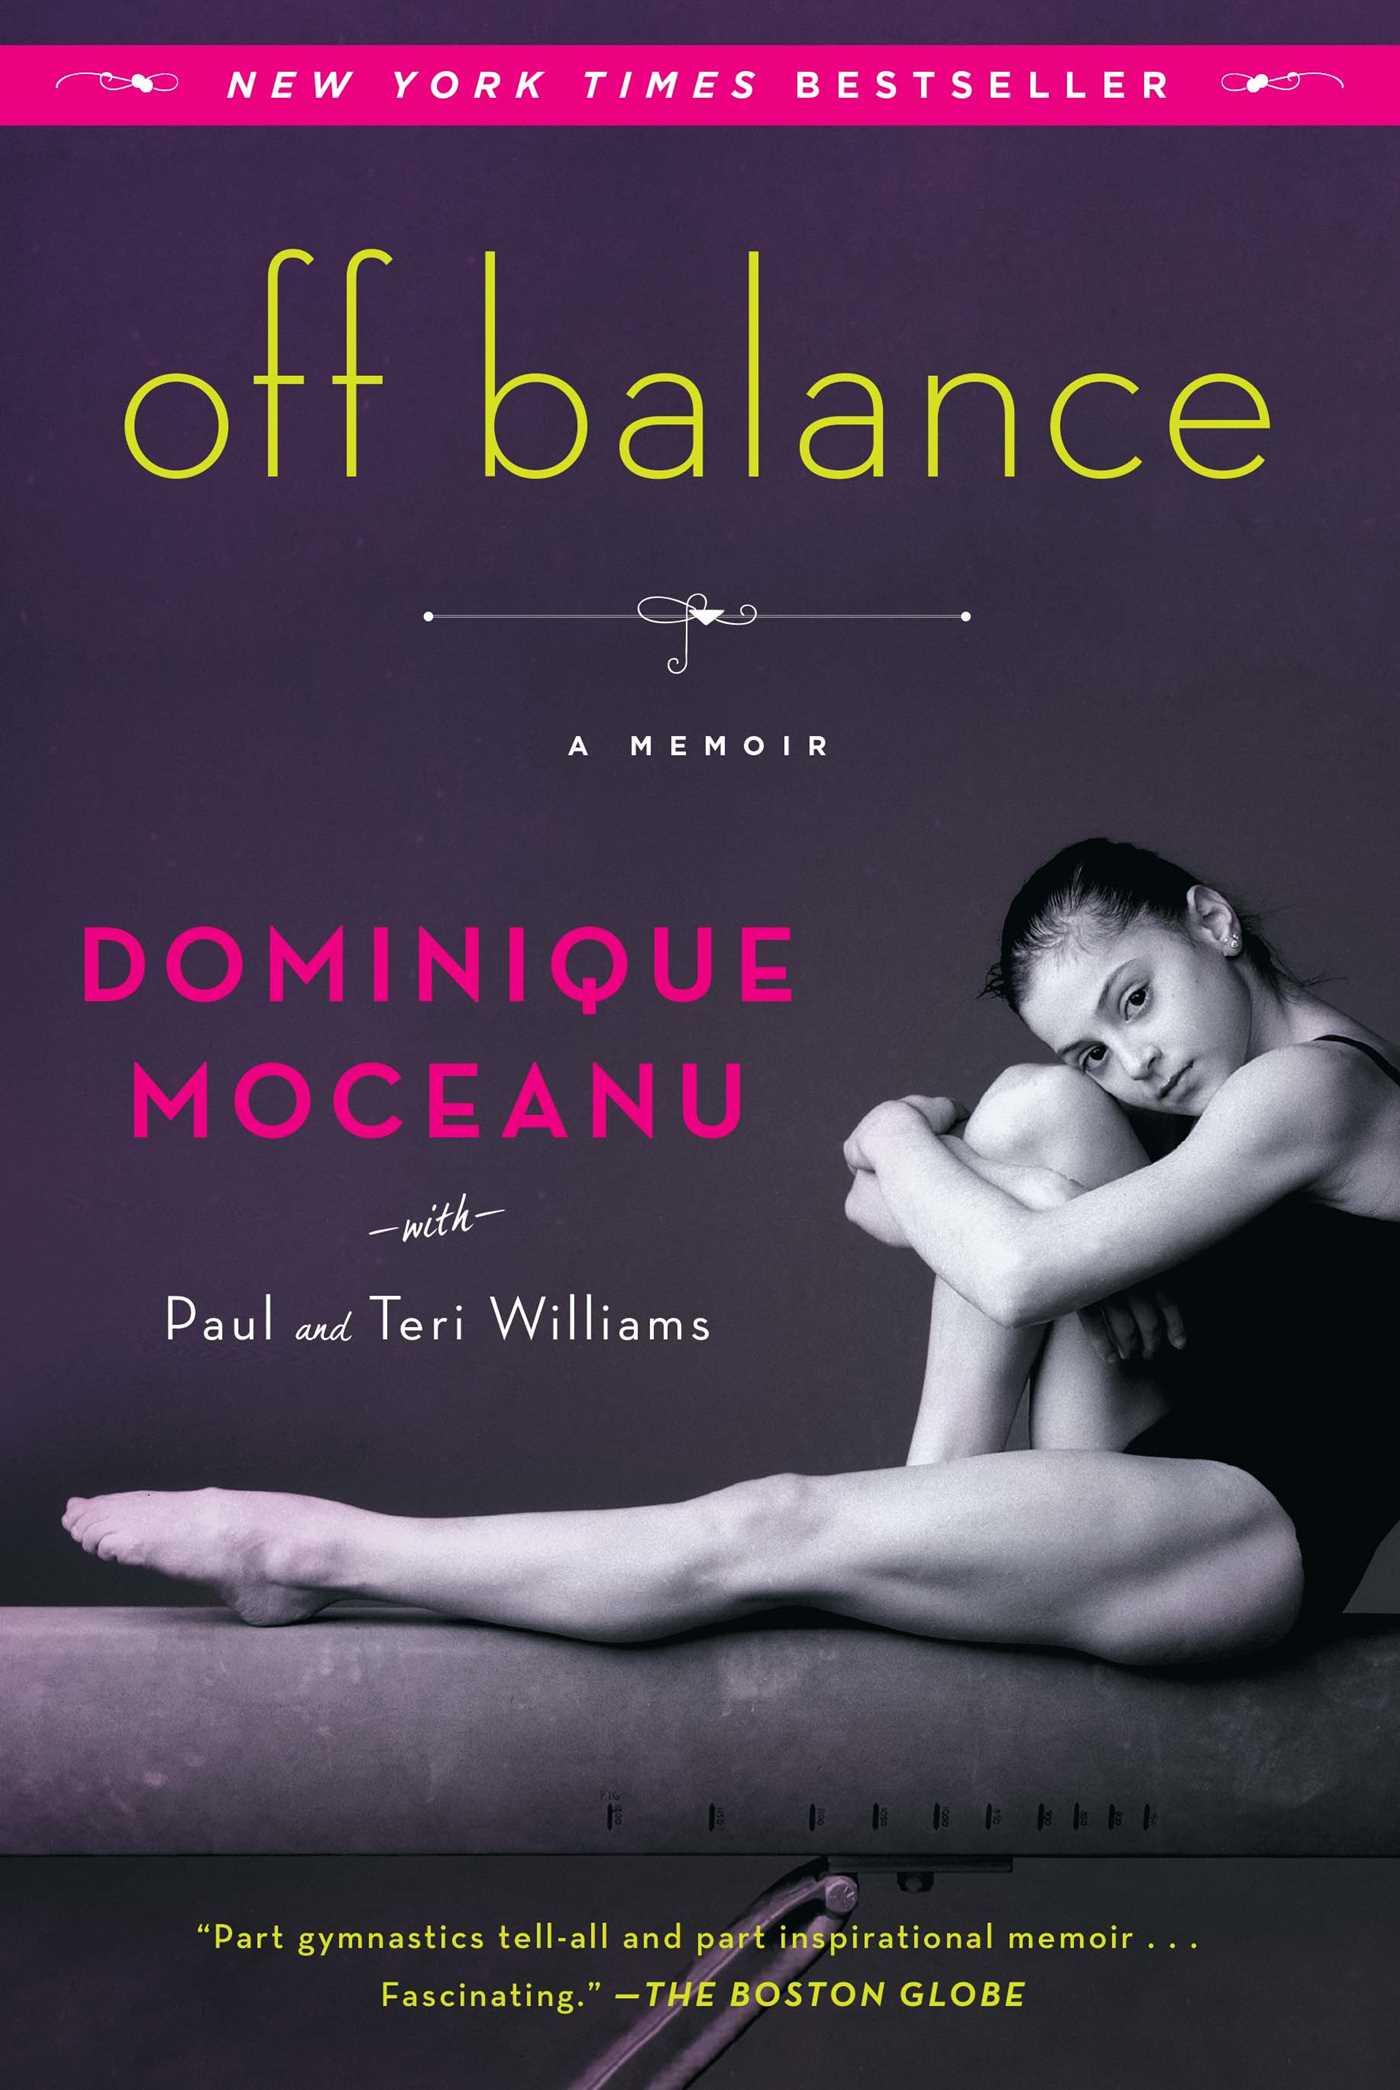 off-balance-9781451608663_hr.jpg